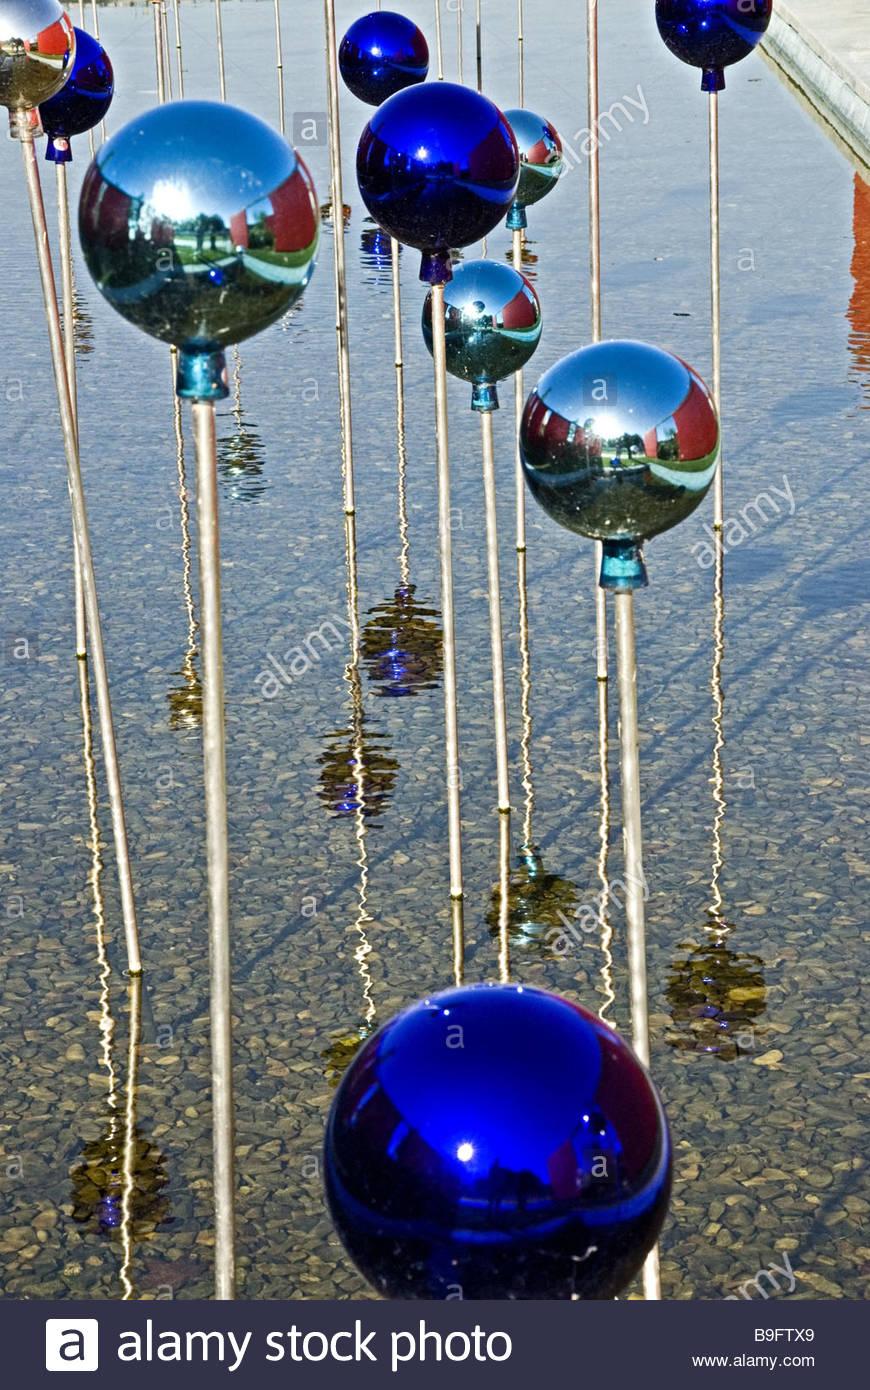 garden water rose-balls reflection pond balls blue decoration